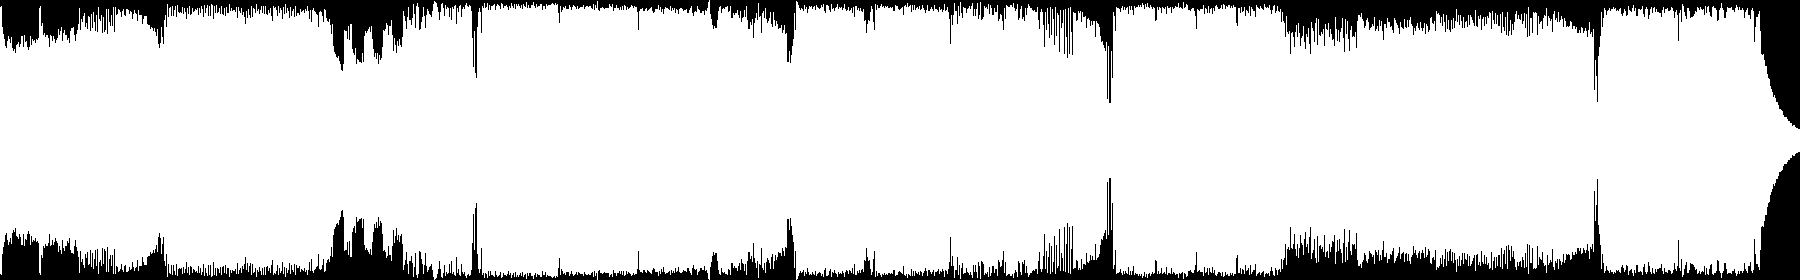 Hardstyle Euphoria audio waveform